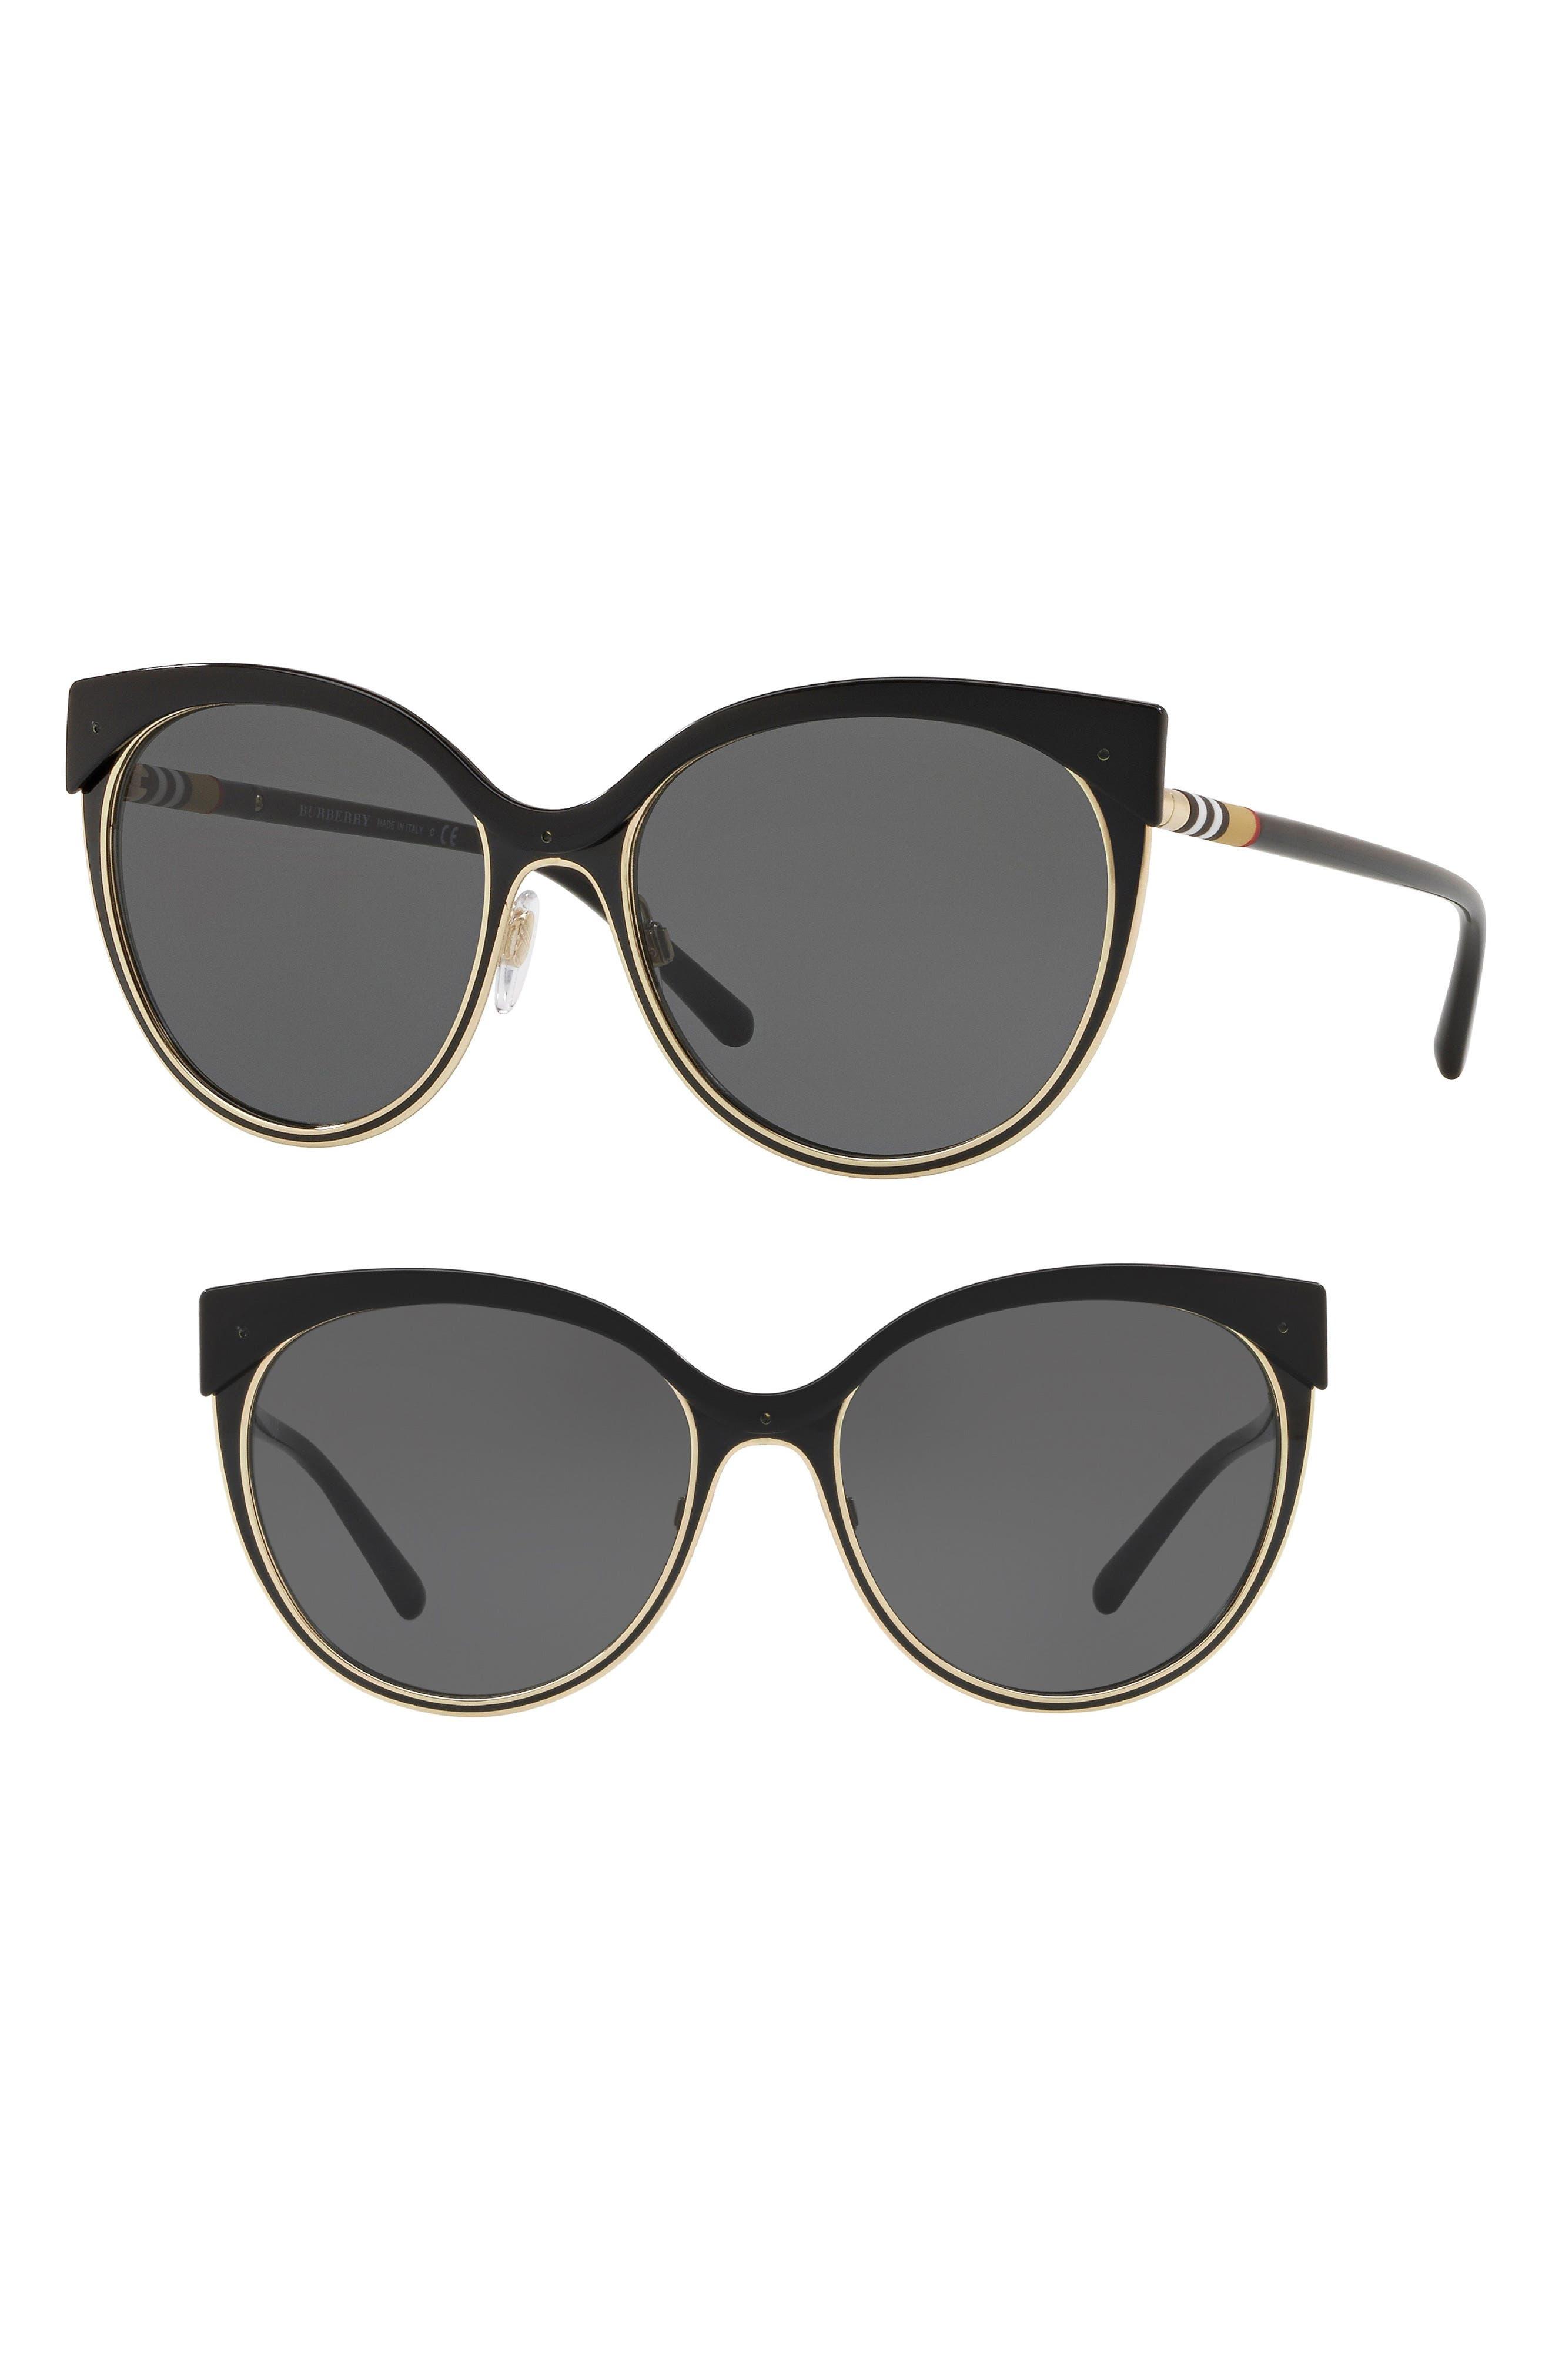 Heritage 55mm Cat Eye Sunglasses,                         Main,                         color, 713